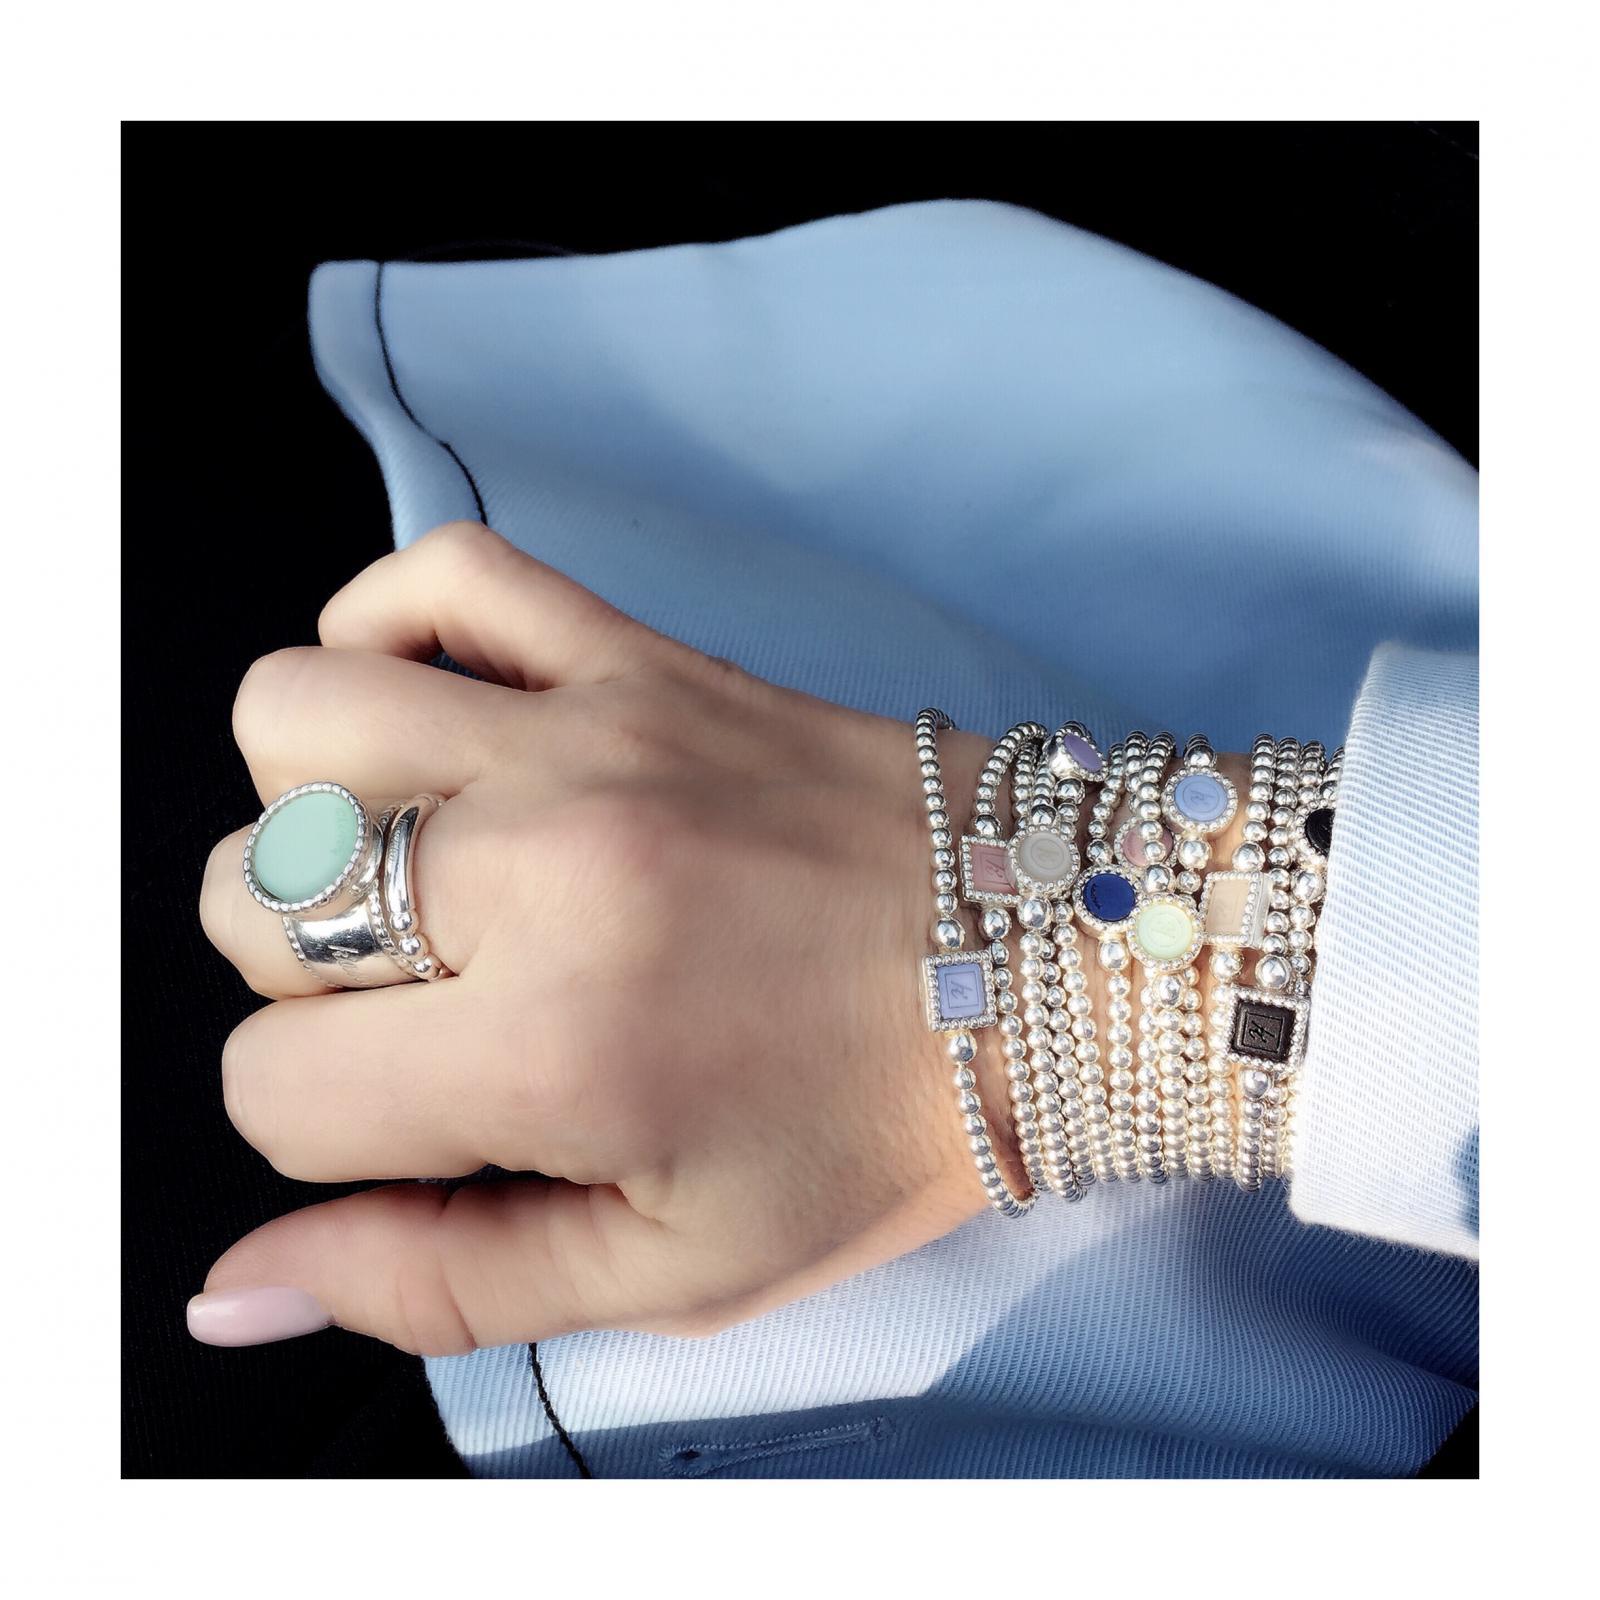 Flexibele 925 sterling zilveren armband vierkante vaste inlay Flexibele 925 sterling zilveren armband ronde vaste inlay Massief 925 sterling zilveren ring met wisselbare inlay Flexibele 925 sterling zilveren ring